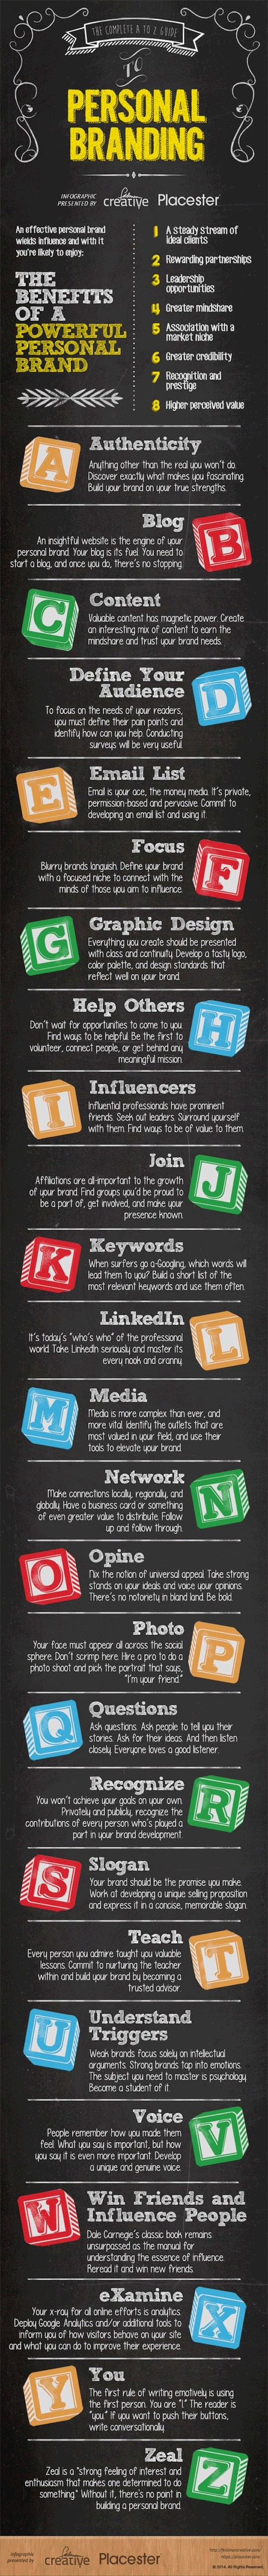 The ABCs of Personal Branding [Infographic] - HubSpot | #TheMarketingTechAlert | Social Medial Marketing | Scoop.it